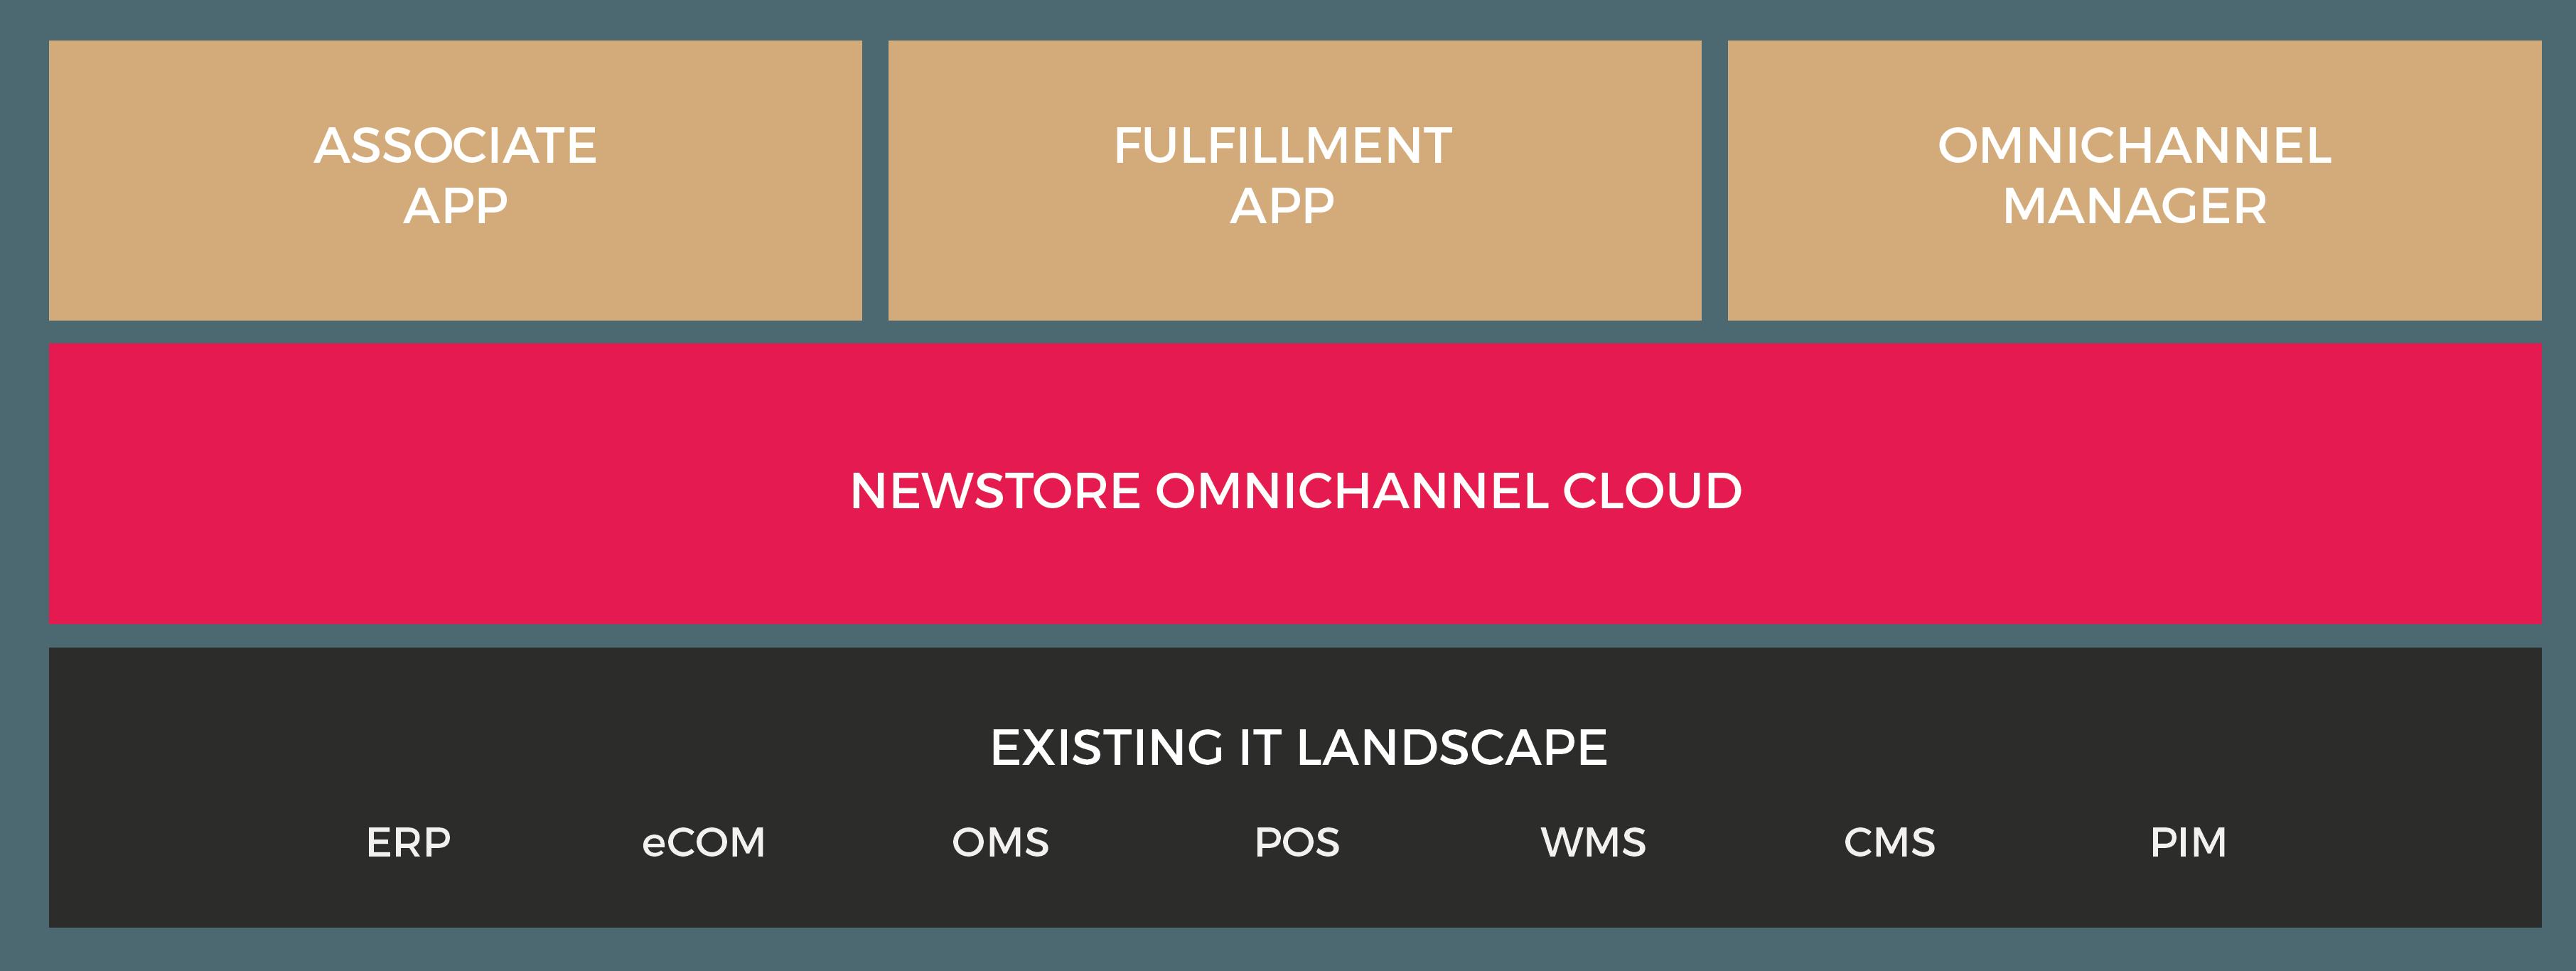 PlatformPage_Infographic-cropped